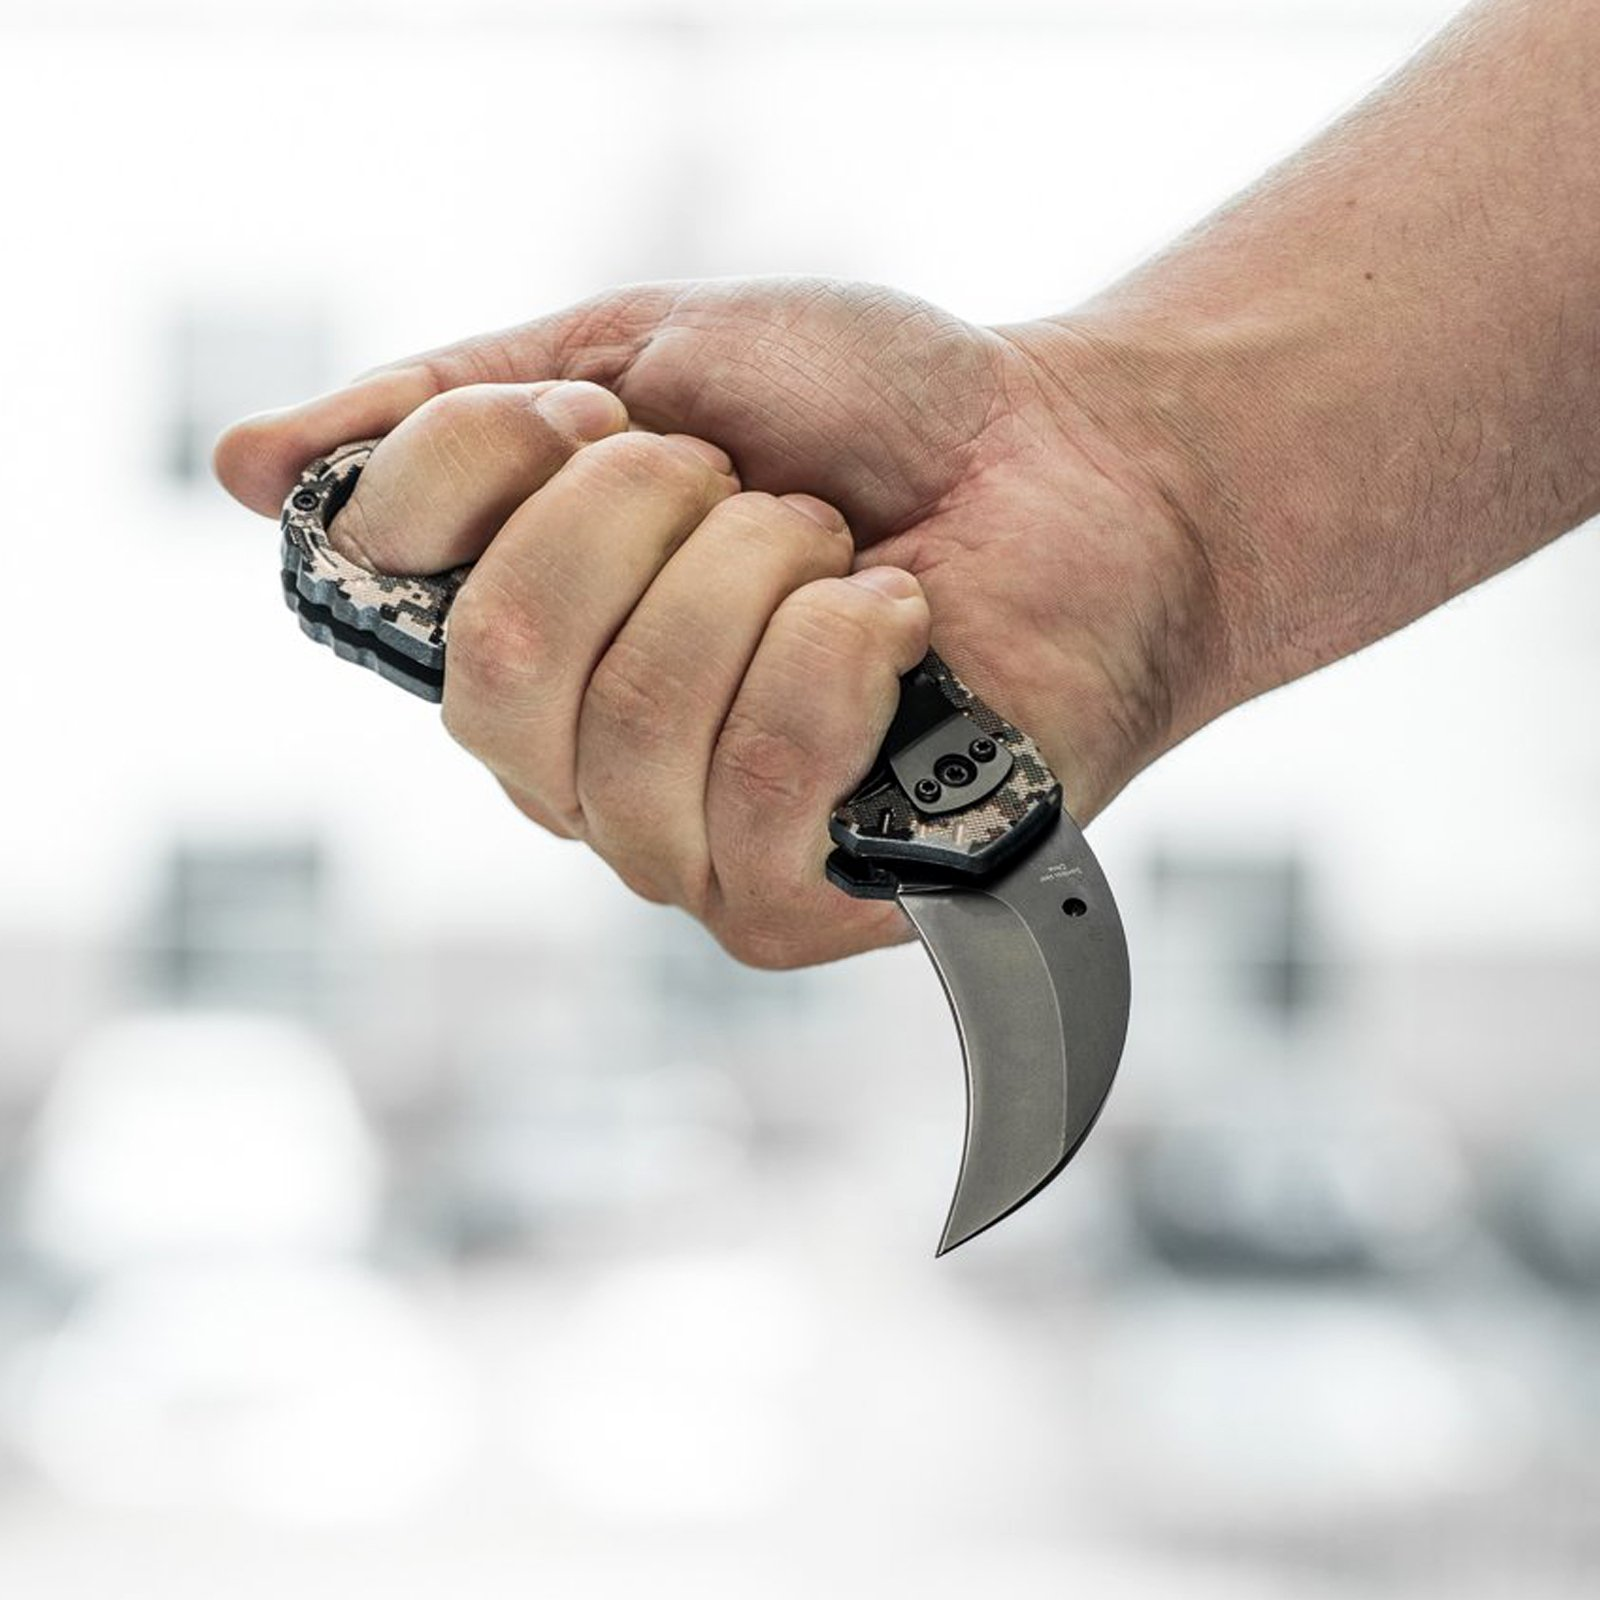 ASR-Outdoor-Hawkbill-Style-Folding-Knife-Digital-Camo-Pocket-Blade-4-Colors miniature 10